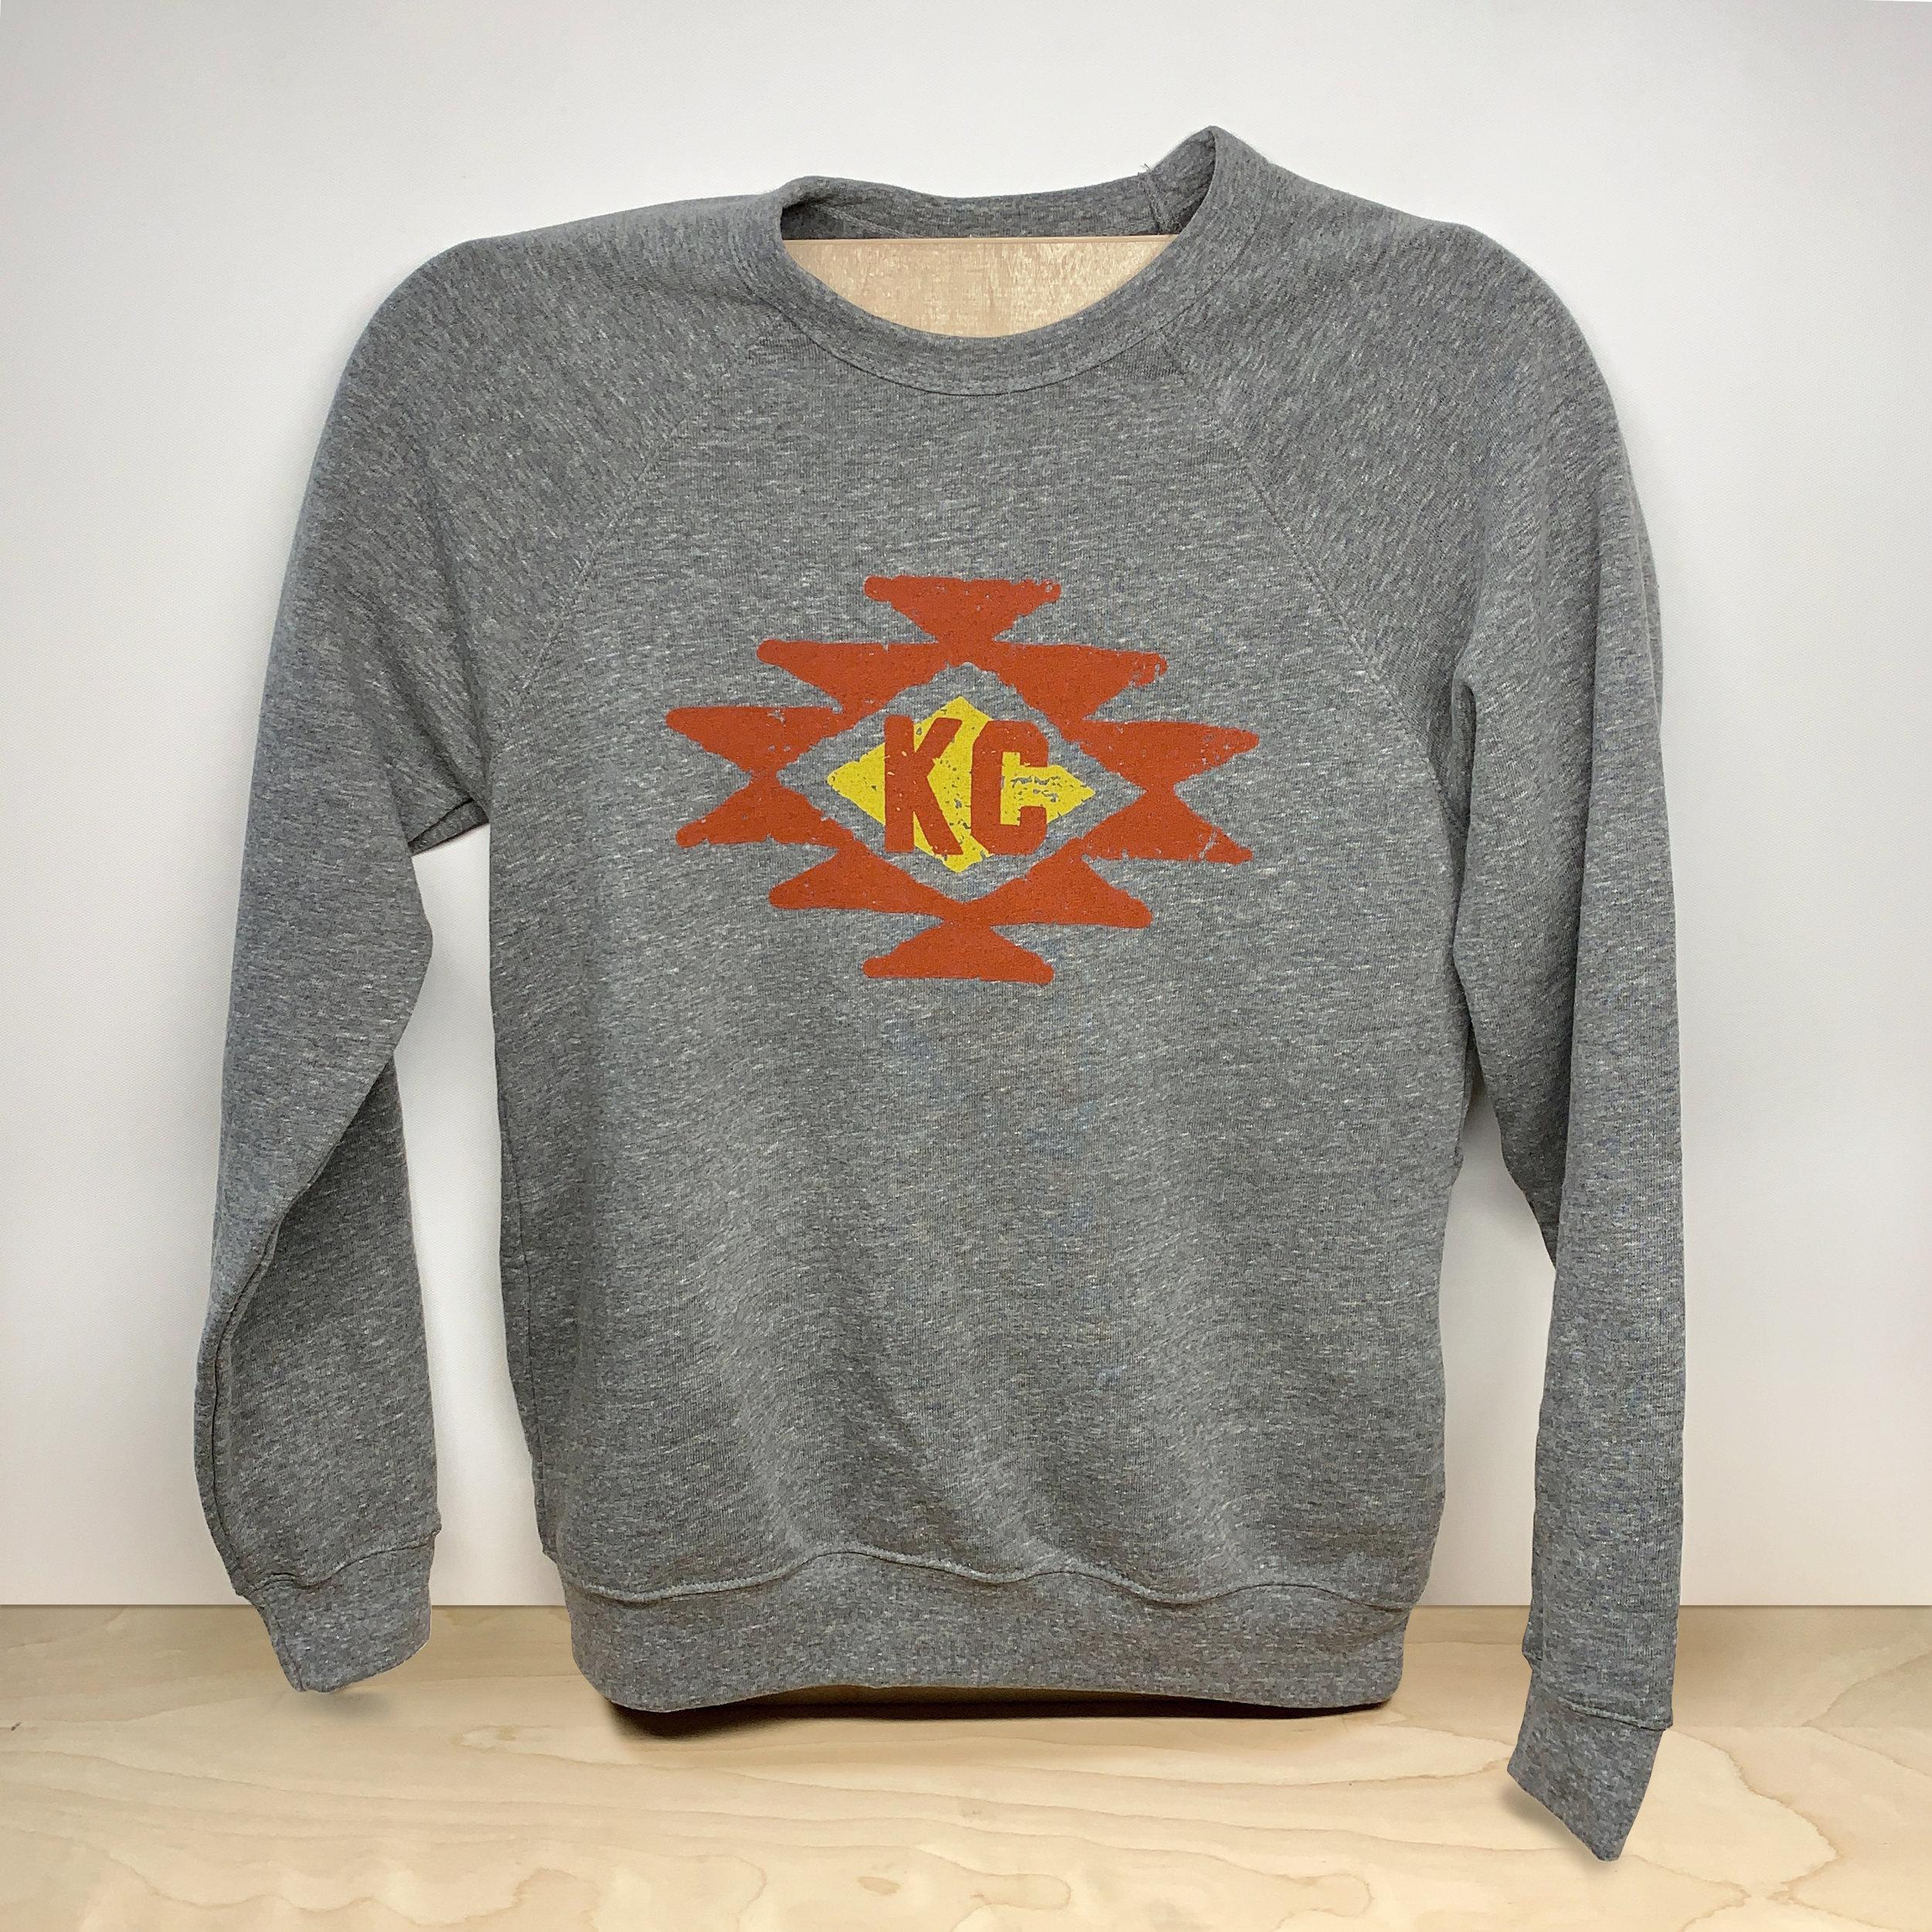 KC Tribe Design